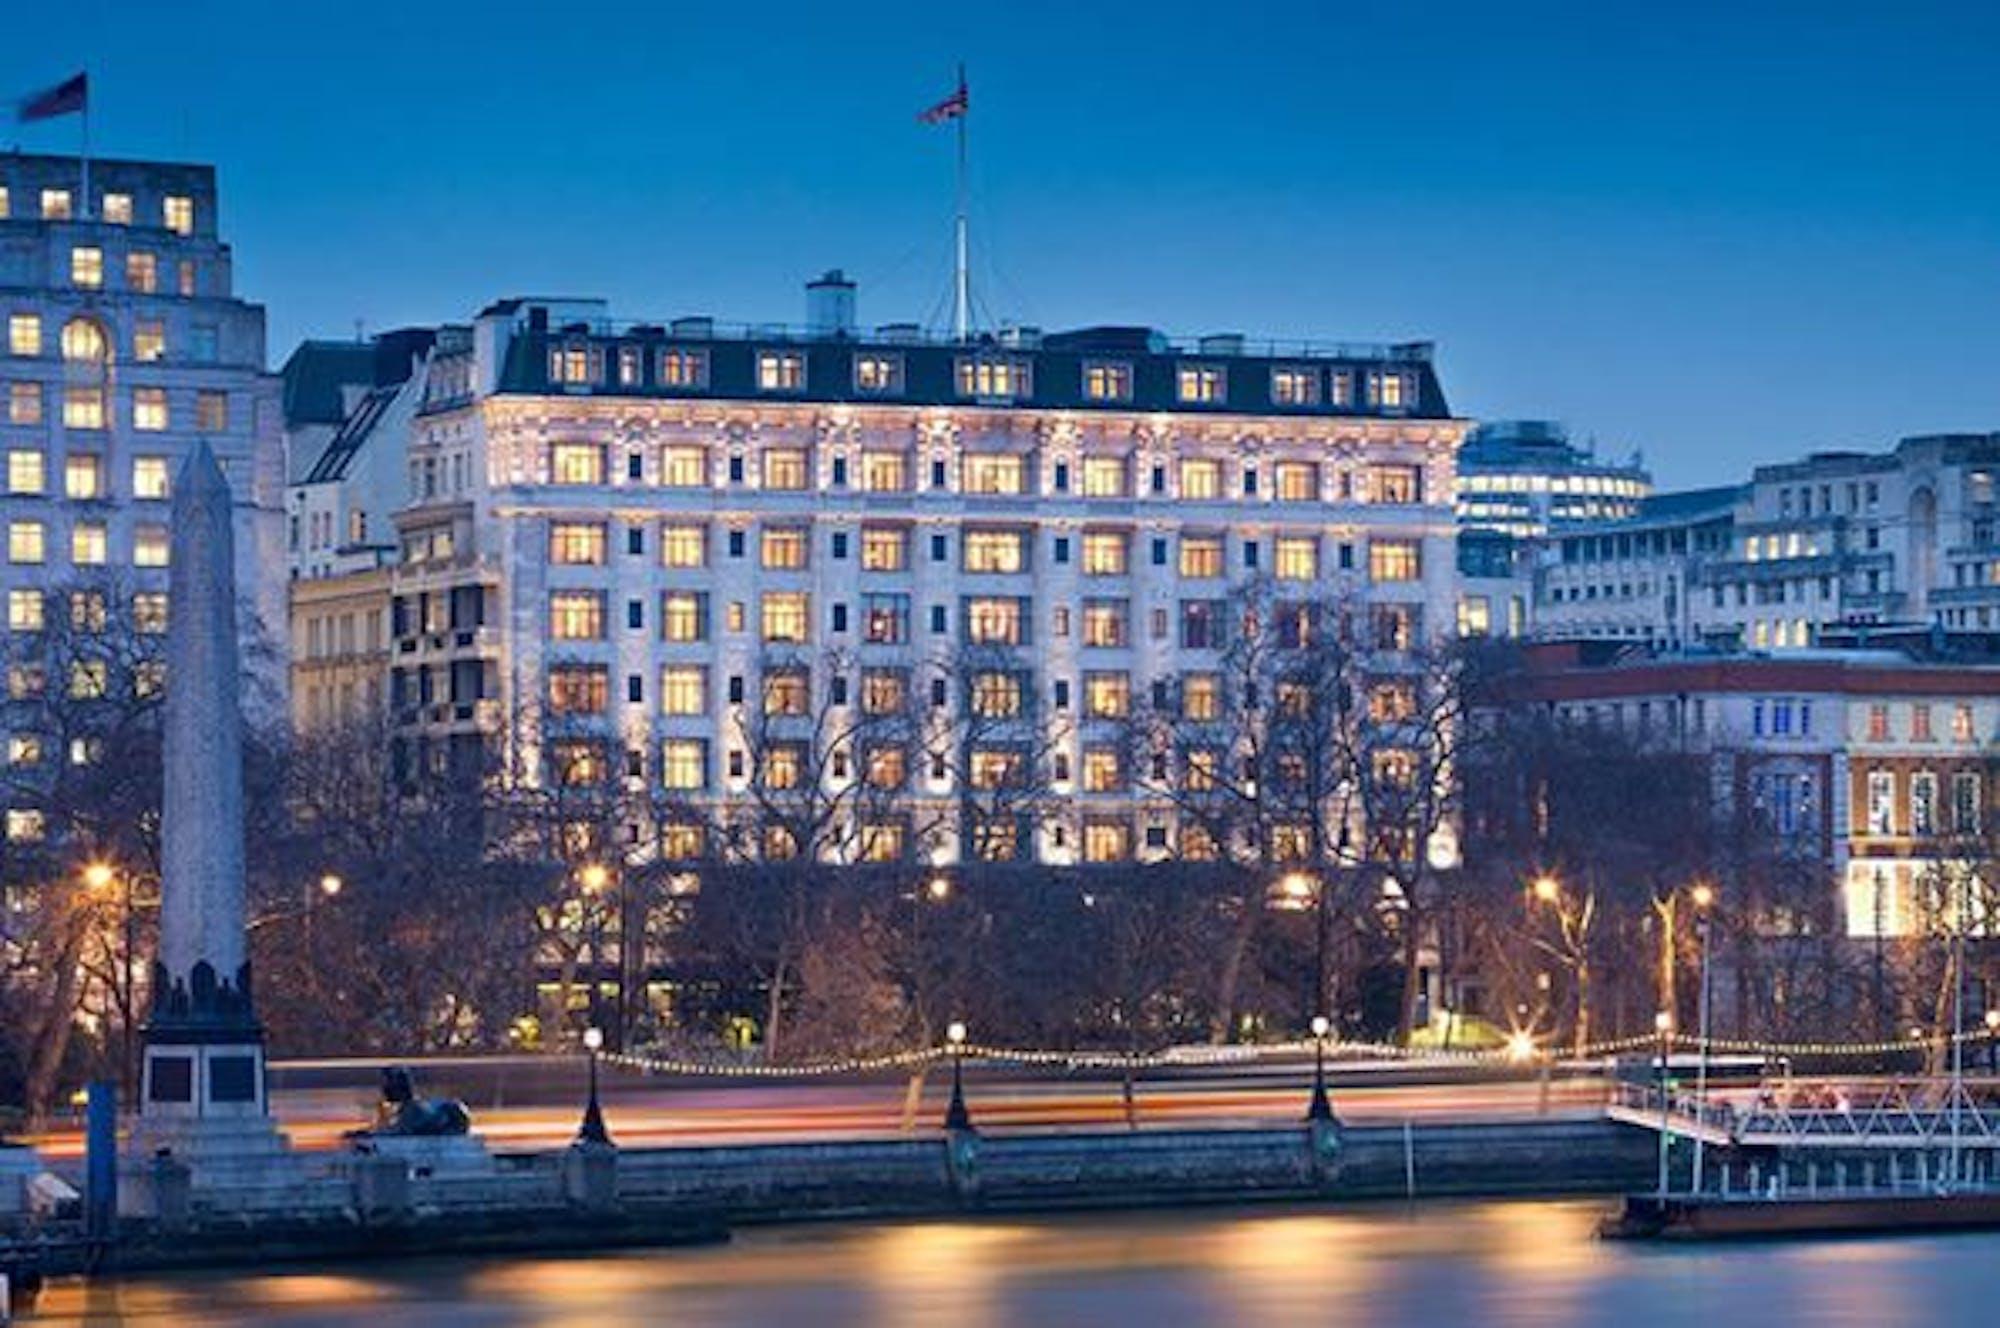 #BuyOnlineLuxury  Winter at The Savoy